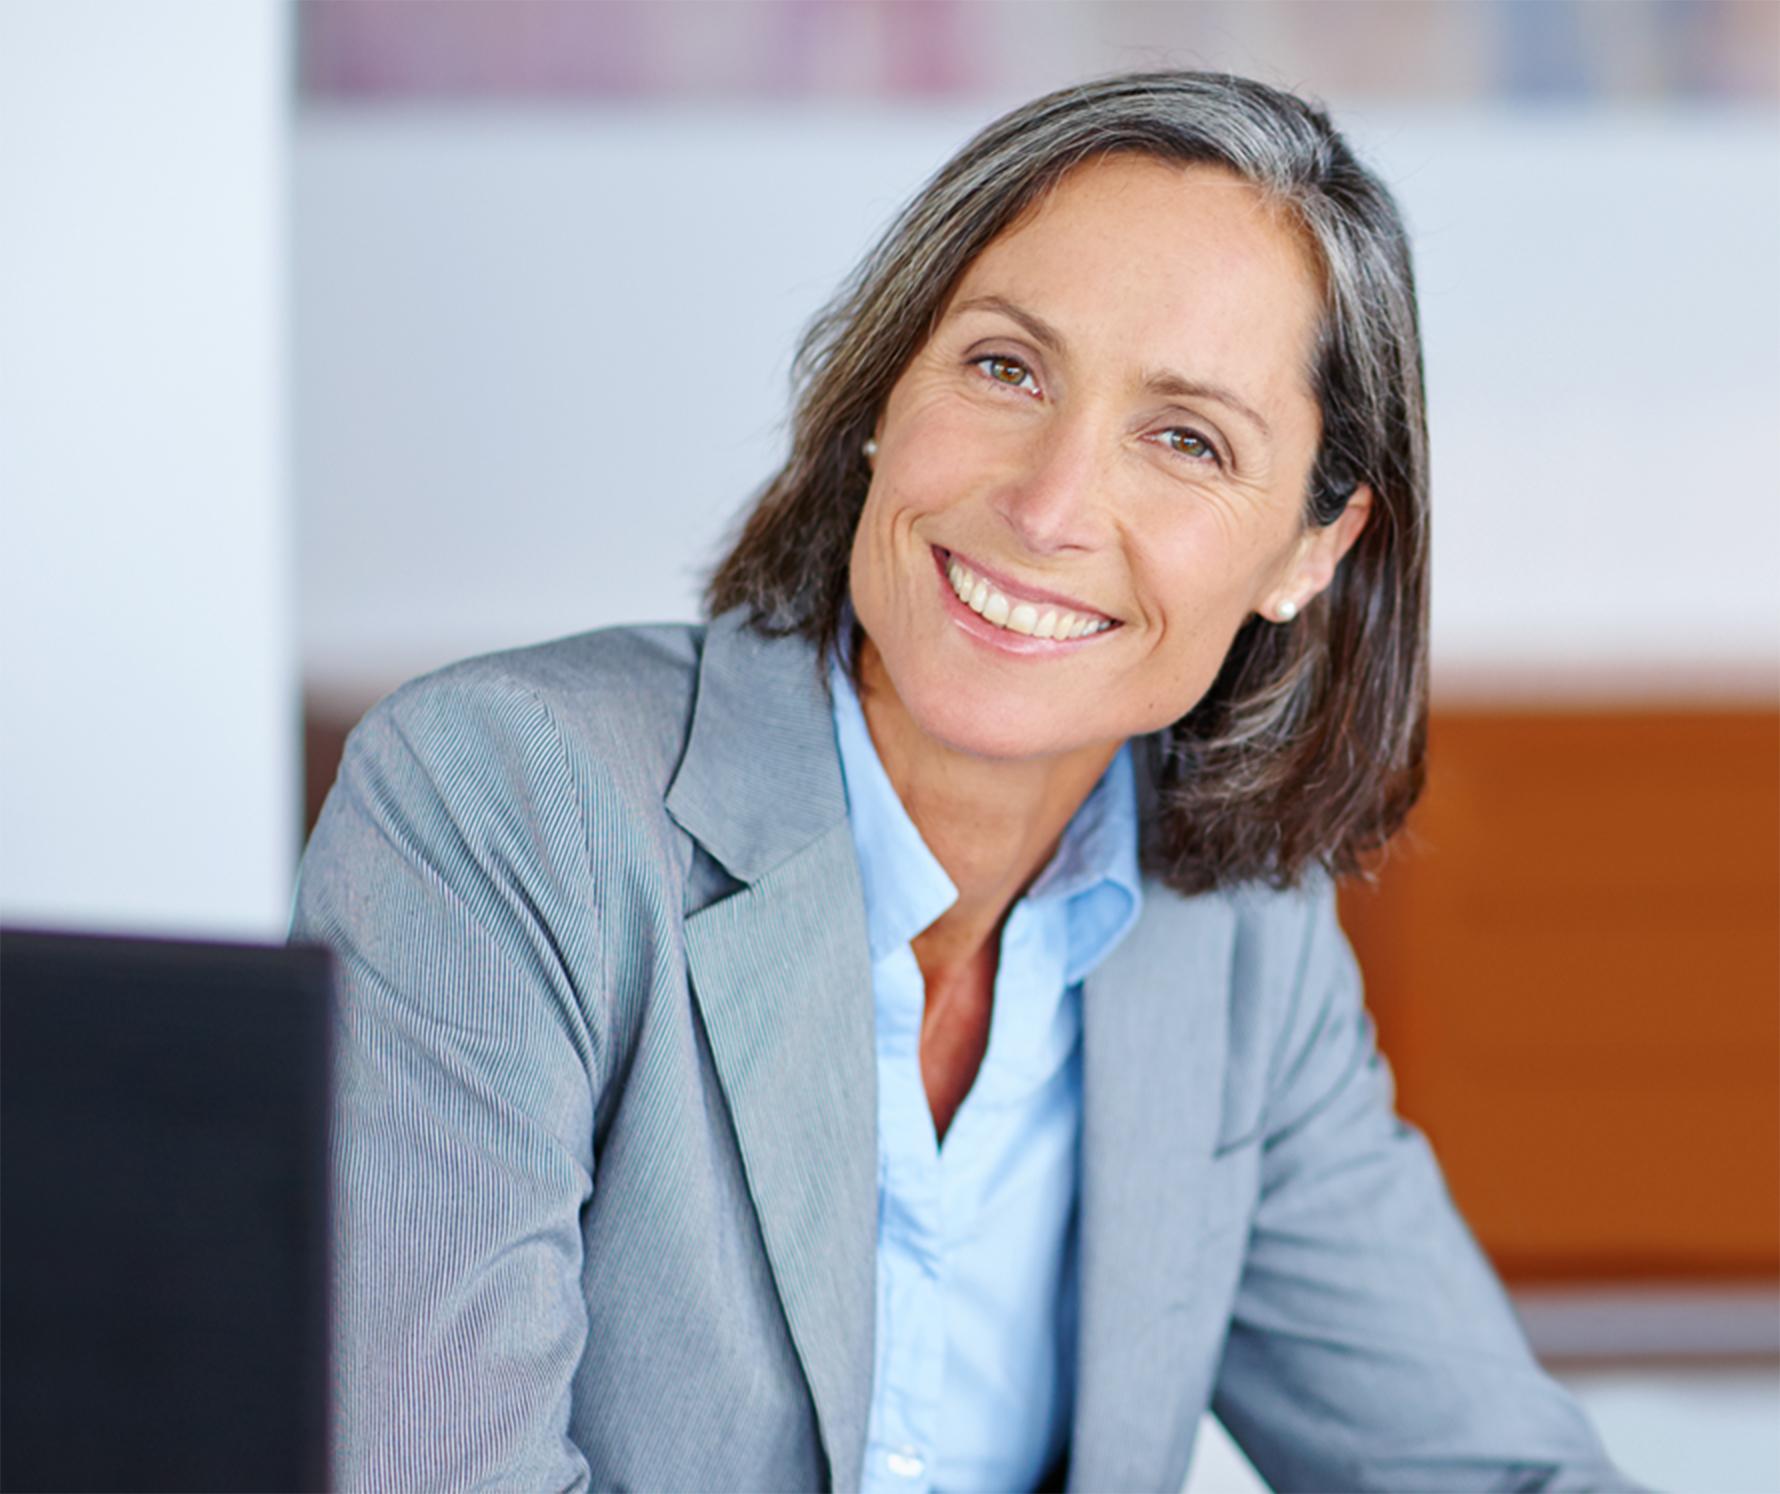 Photograph of a female, caucasian, executive.